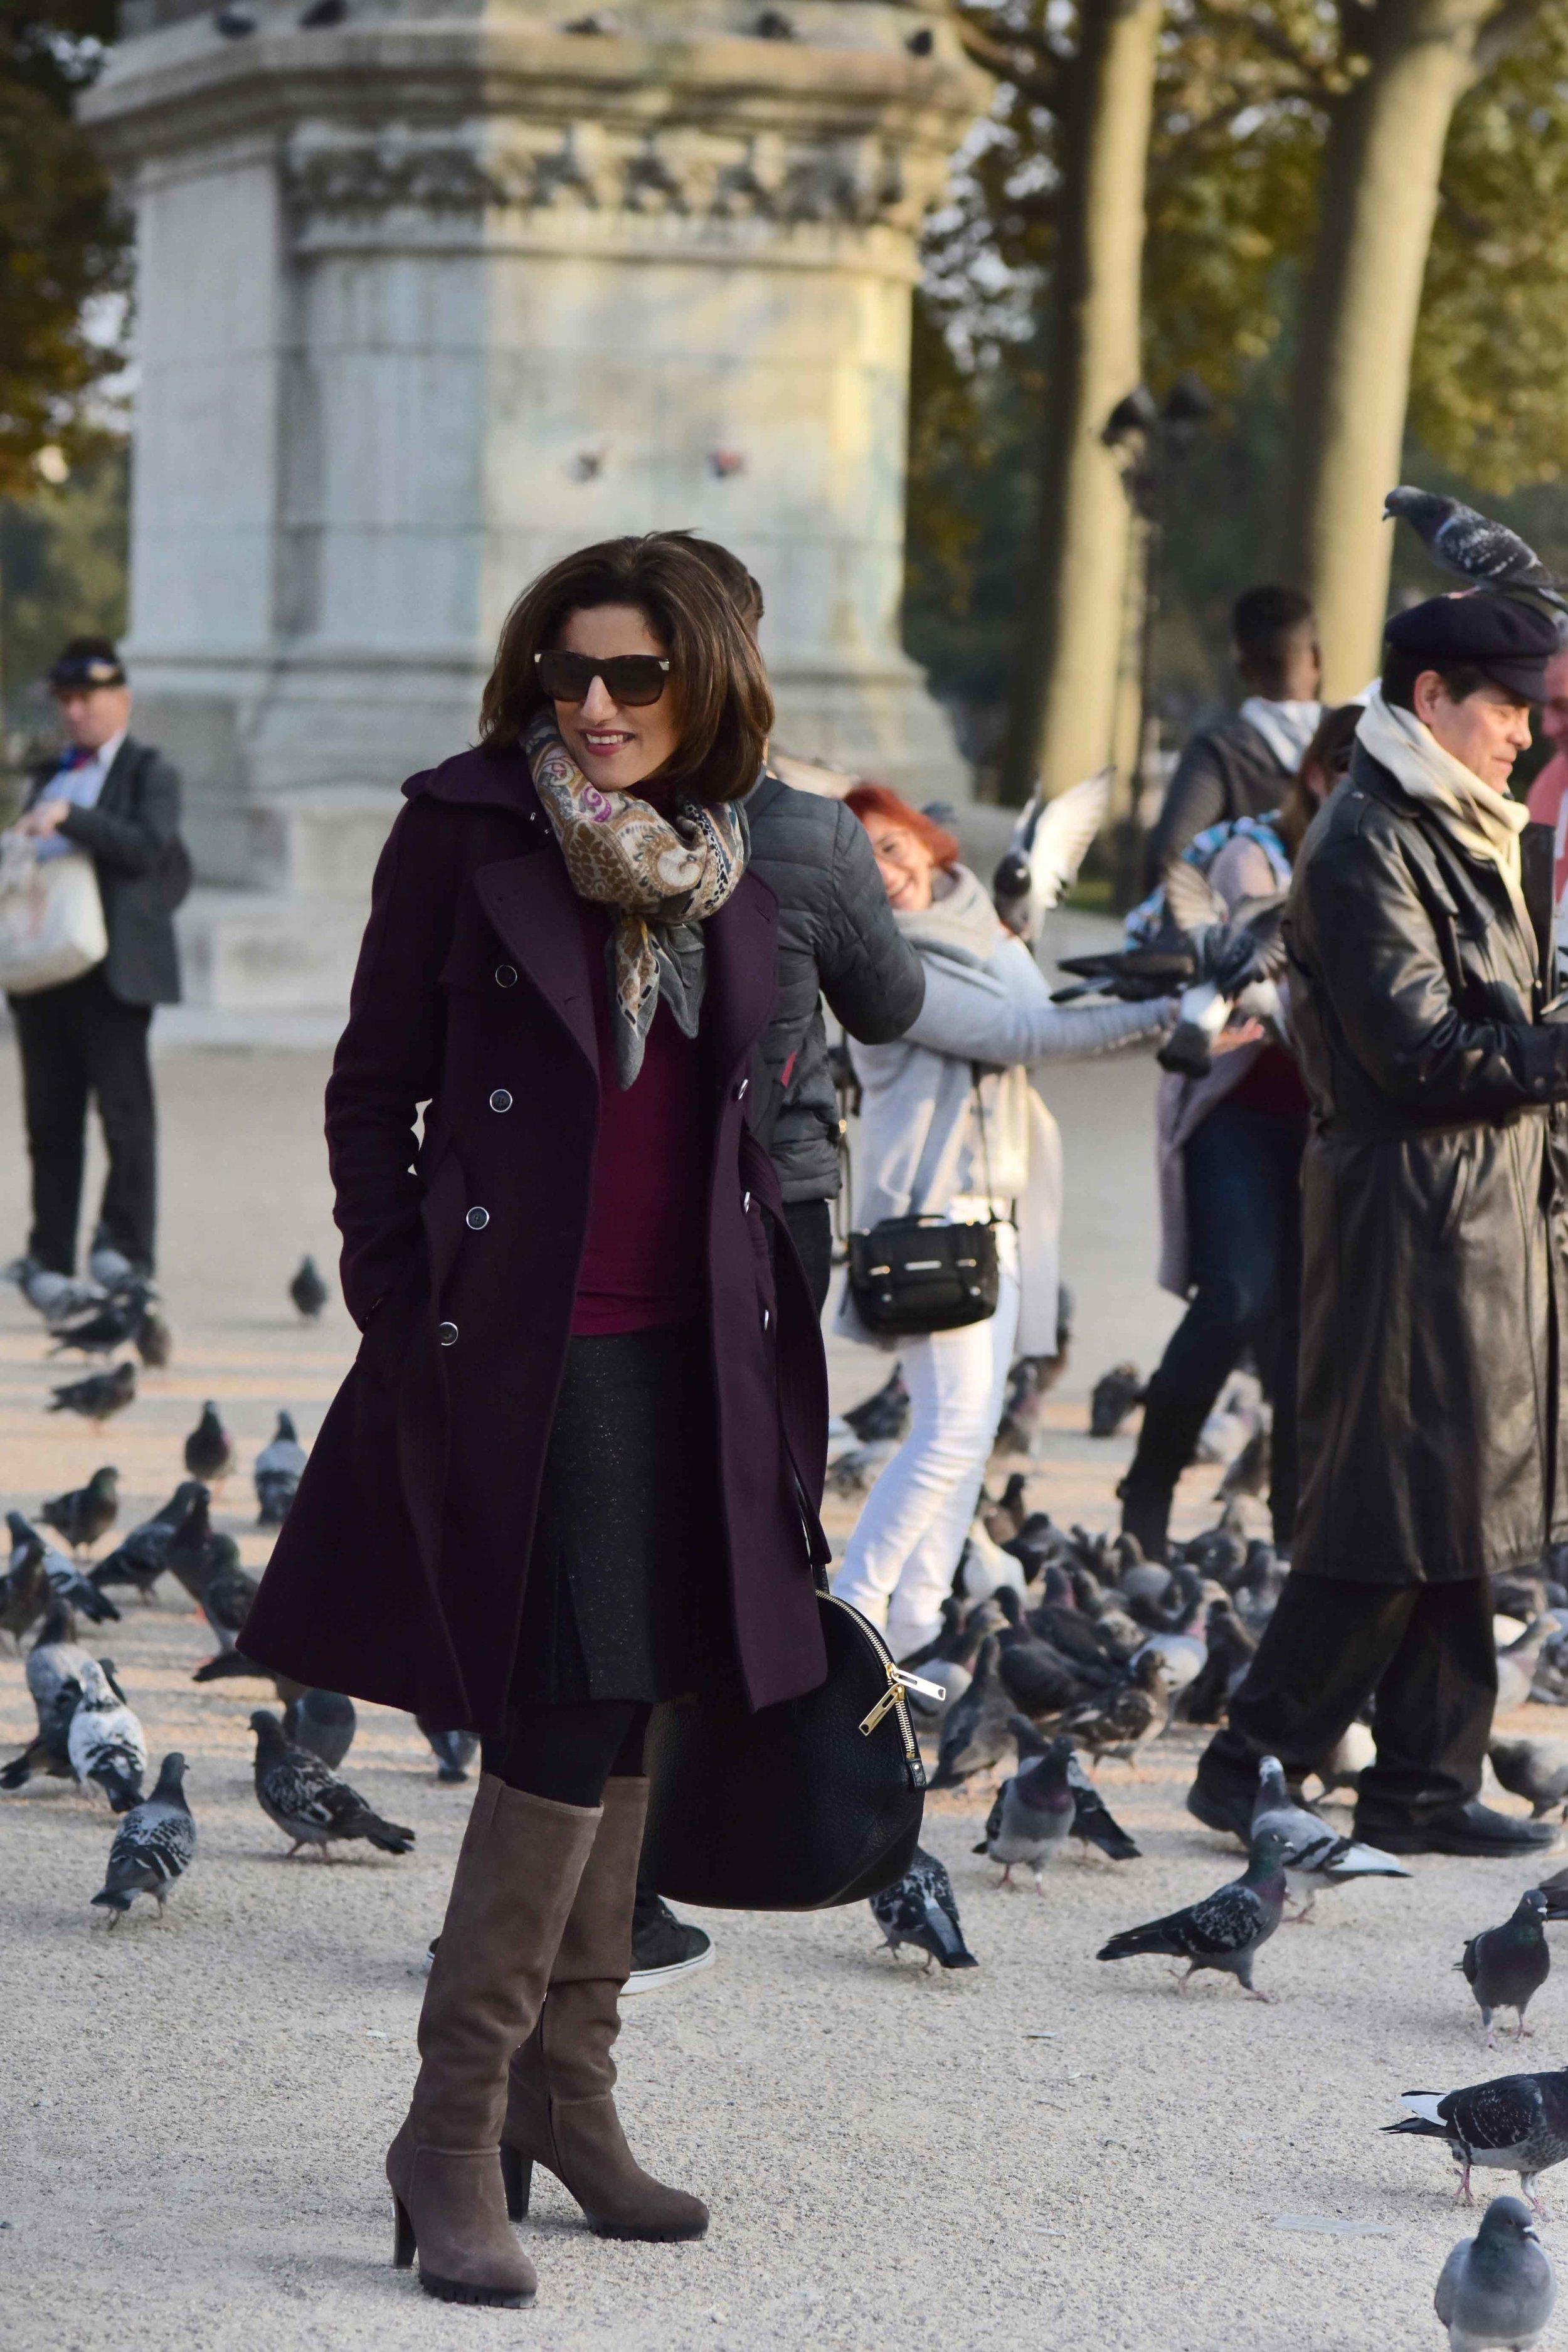 Karen Millen fall winter coat, Karen Millen boots, Burberry bag, Hallhuber scarf, Guccci sunglasses, Notre-Dame, Paris. Image©sourcingstyle.com